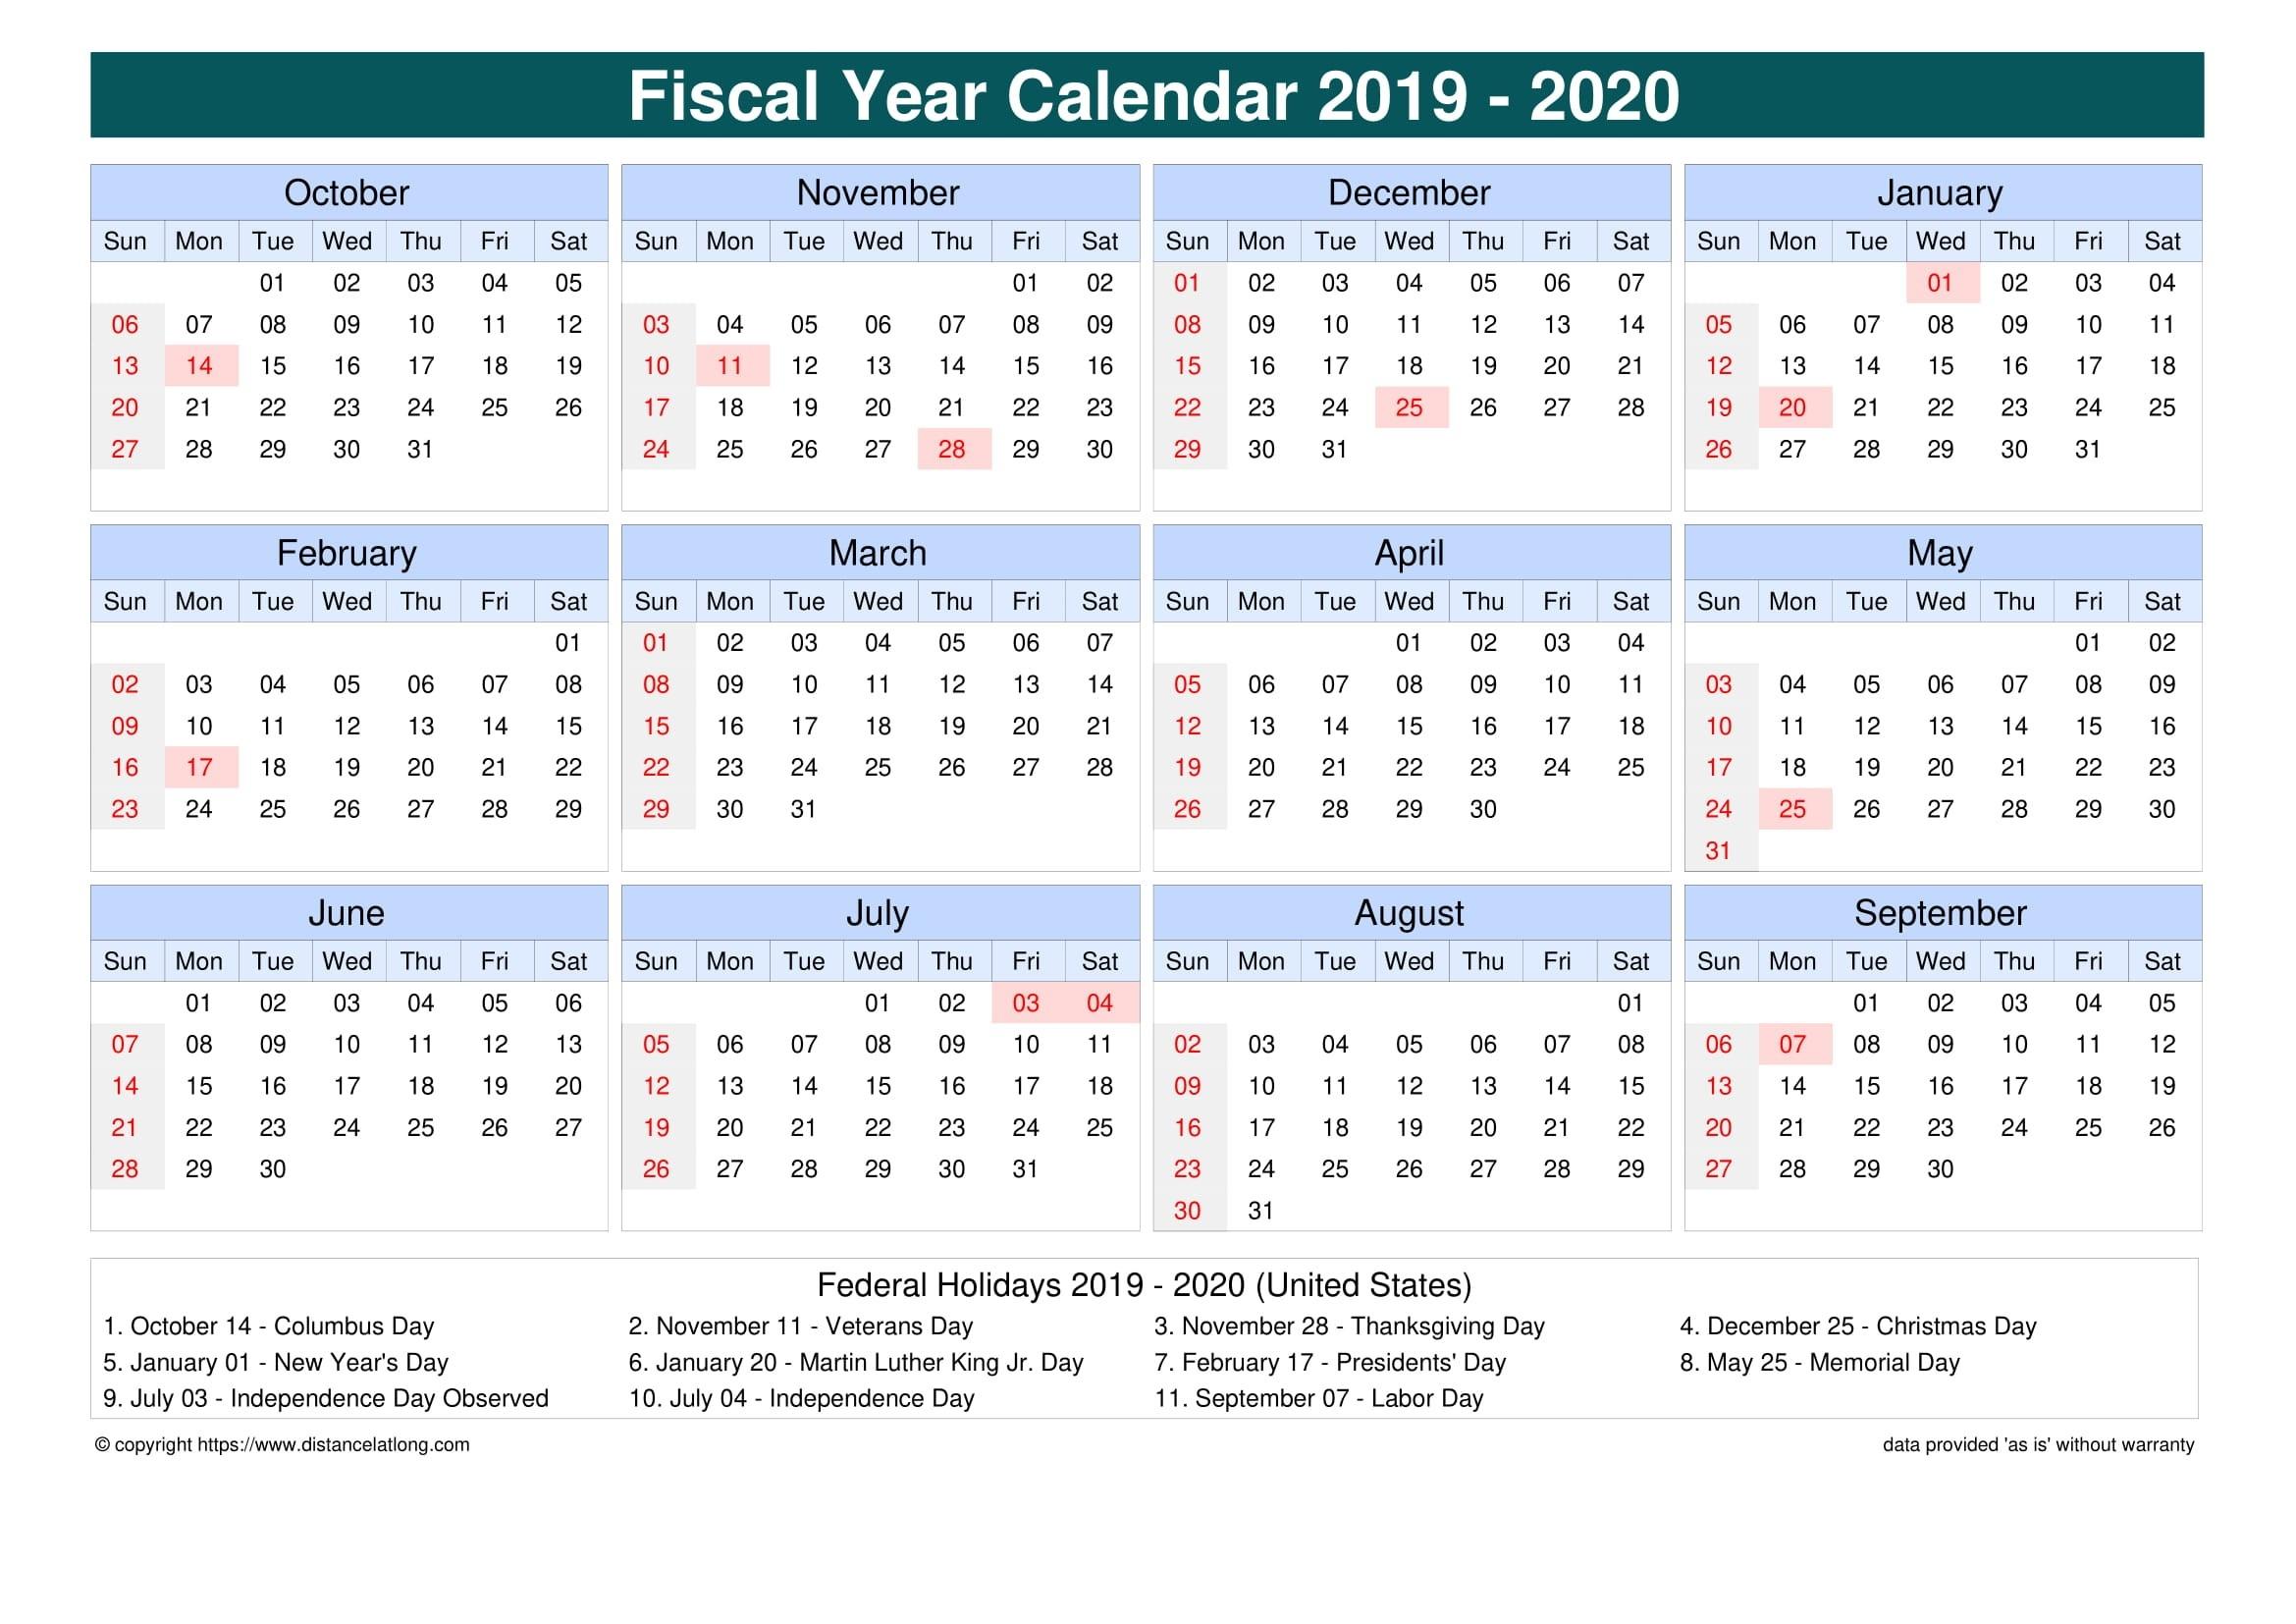 Fiscal Year 2019-2020 Calendar Templates, Free Printable  Calendar 18/19 Financial Year Australia